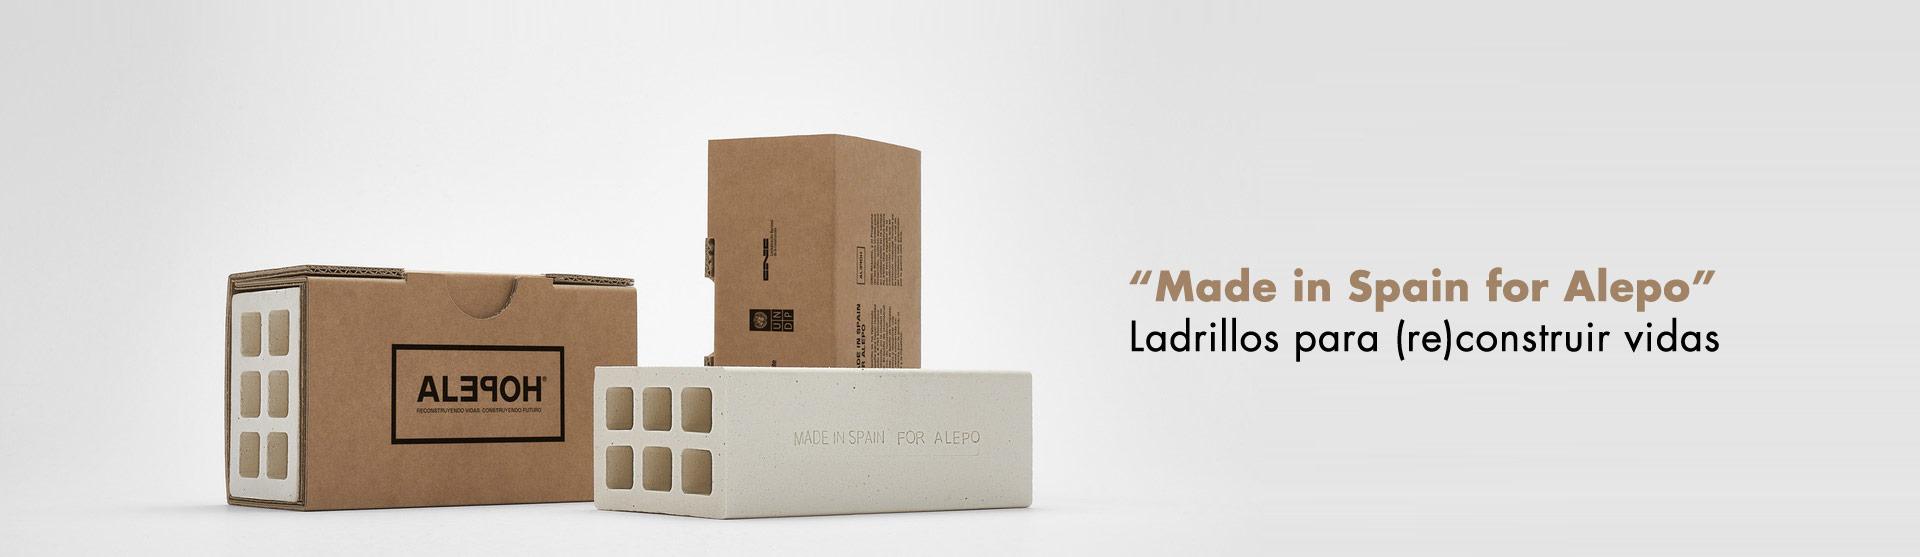 slide-ladrillos-2019